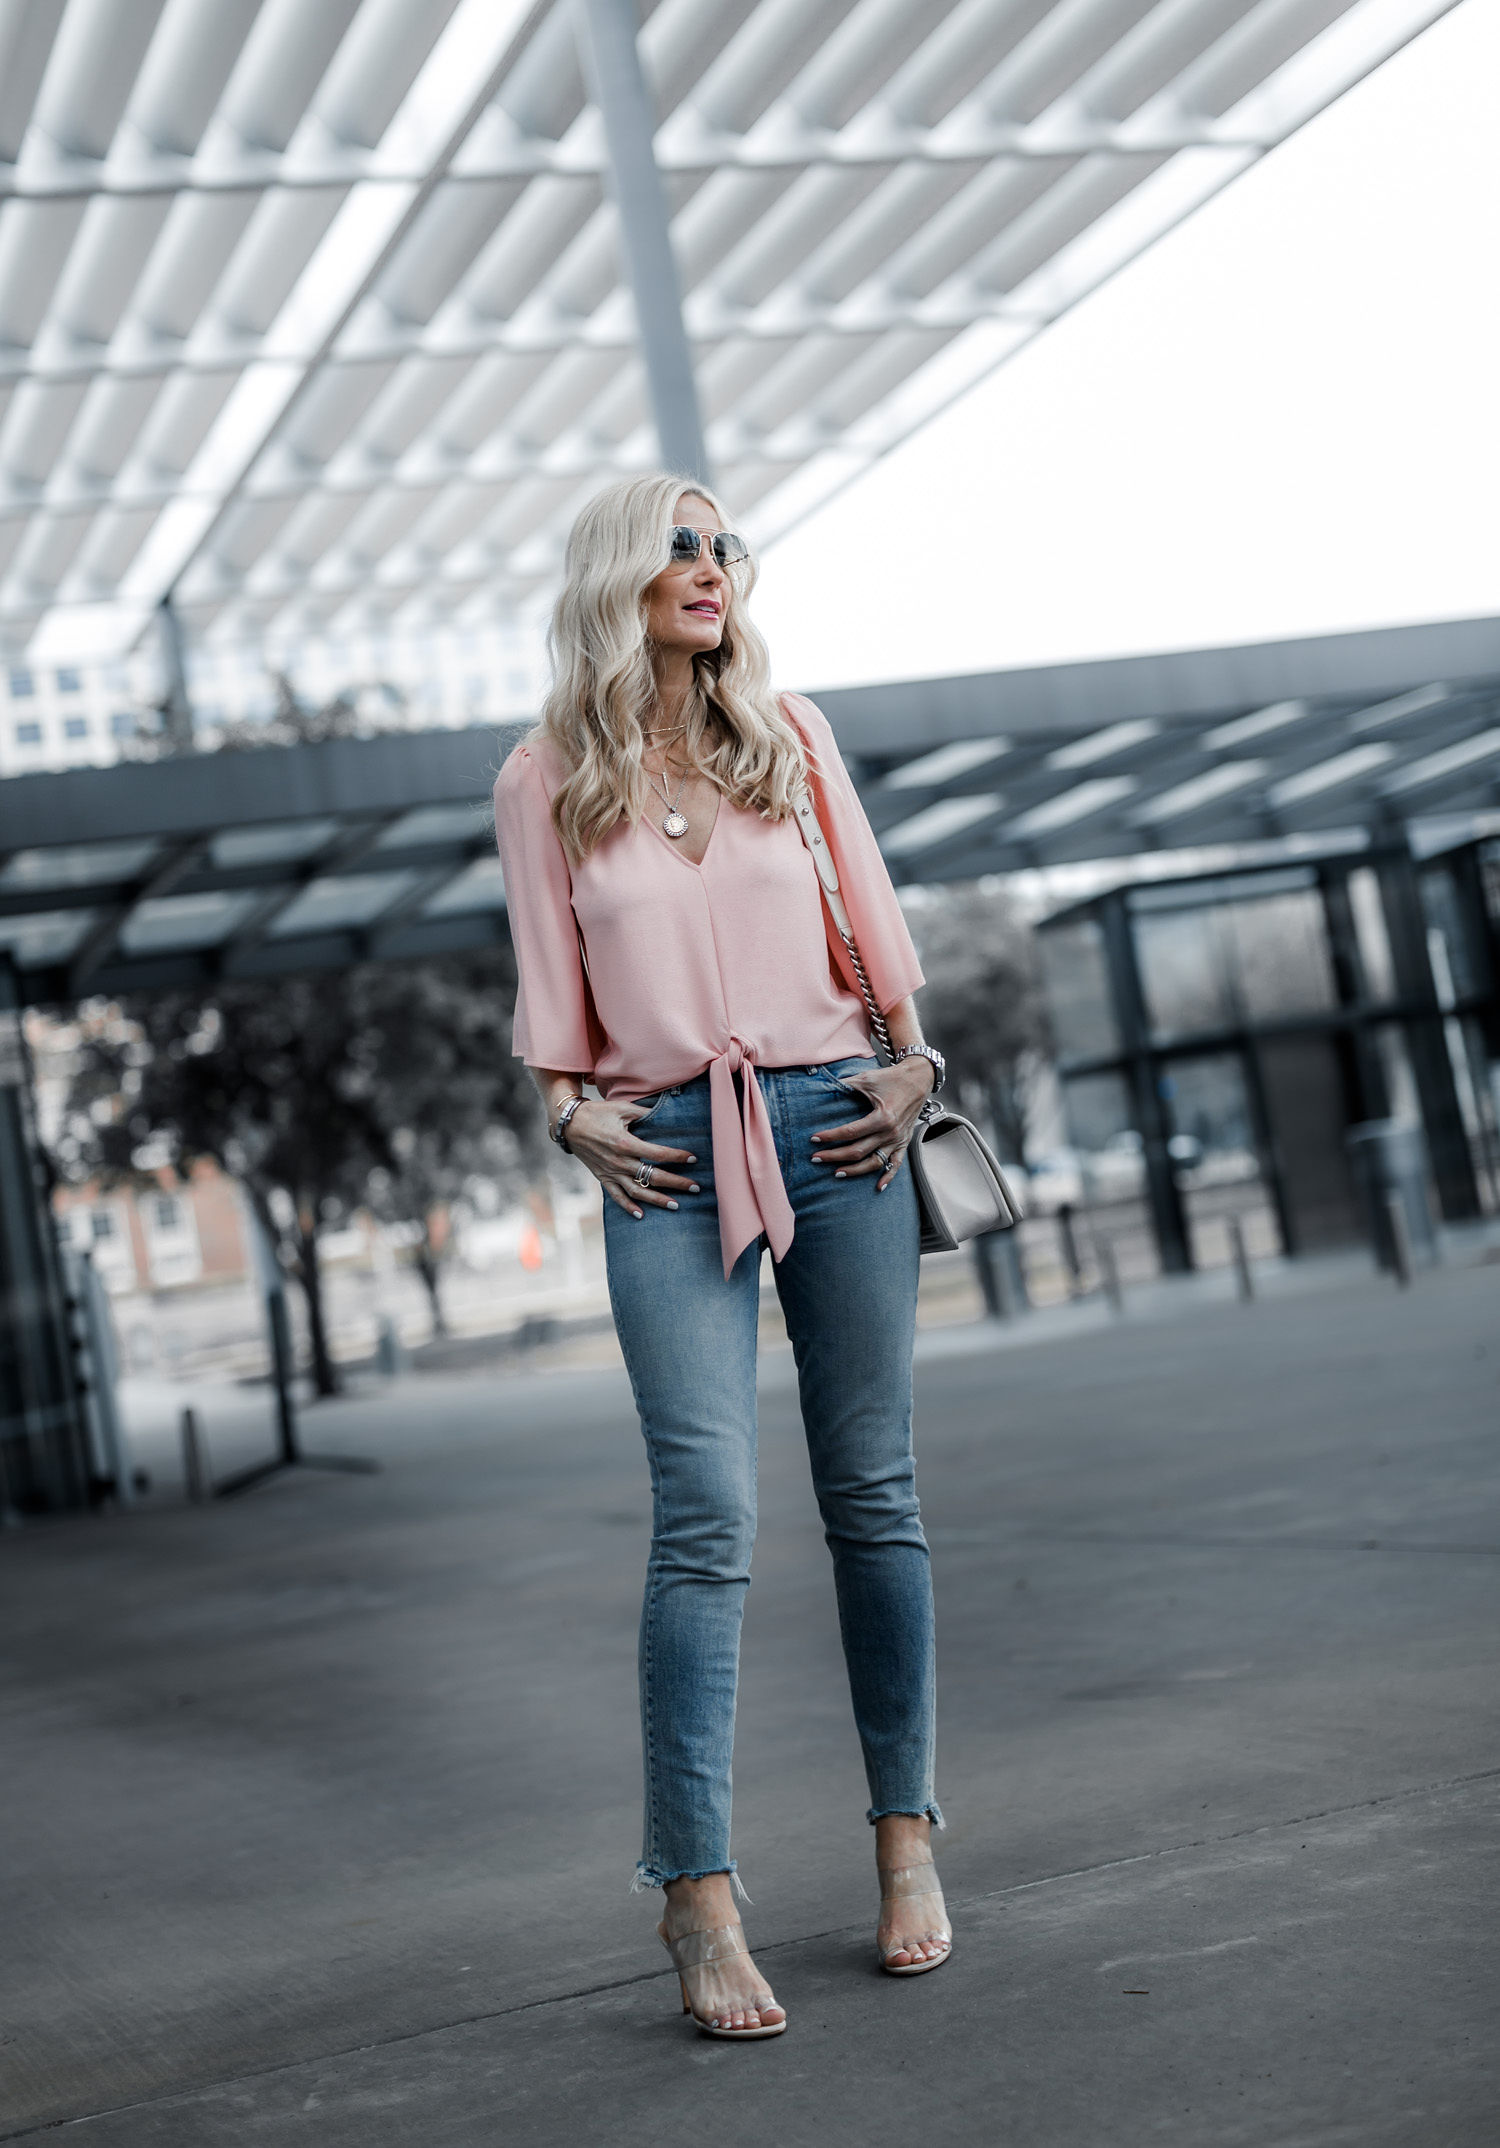 Dallas fashion blogger wearing Mother denim jeans